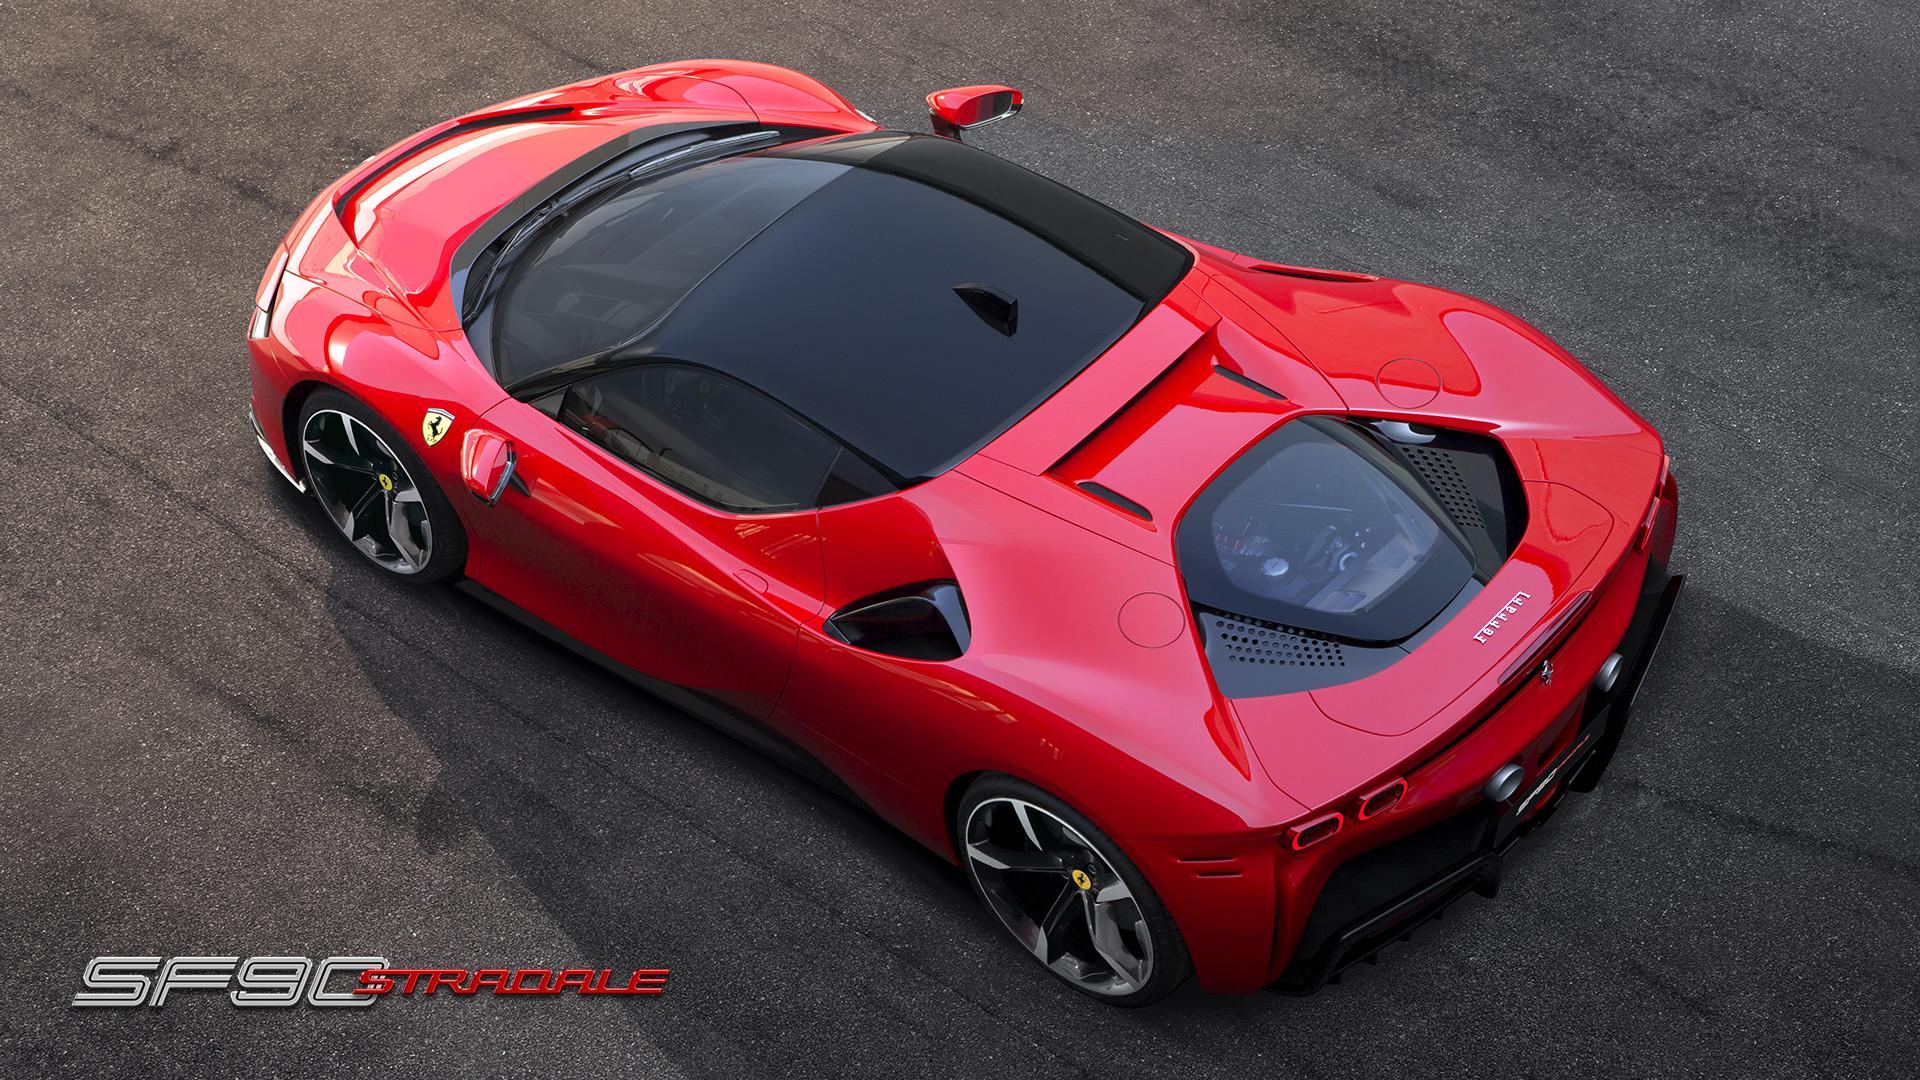 2020 Ferrari SF90 Stradale roof view